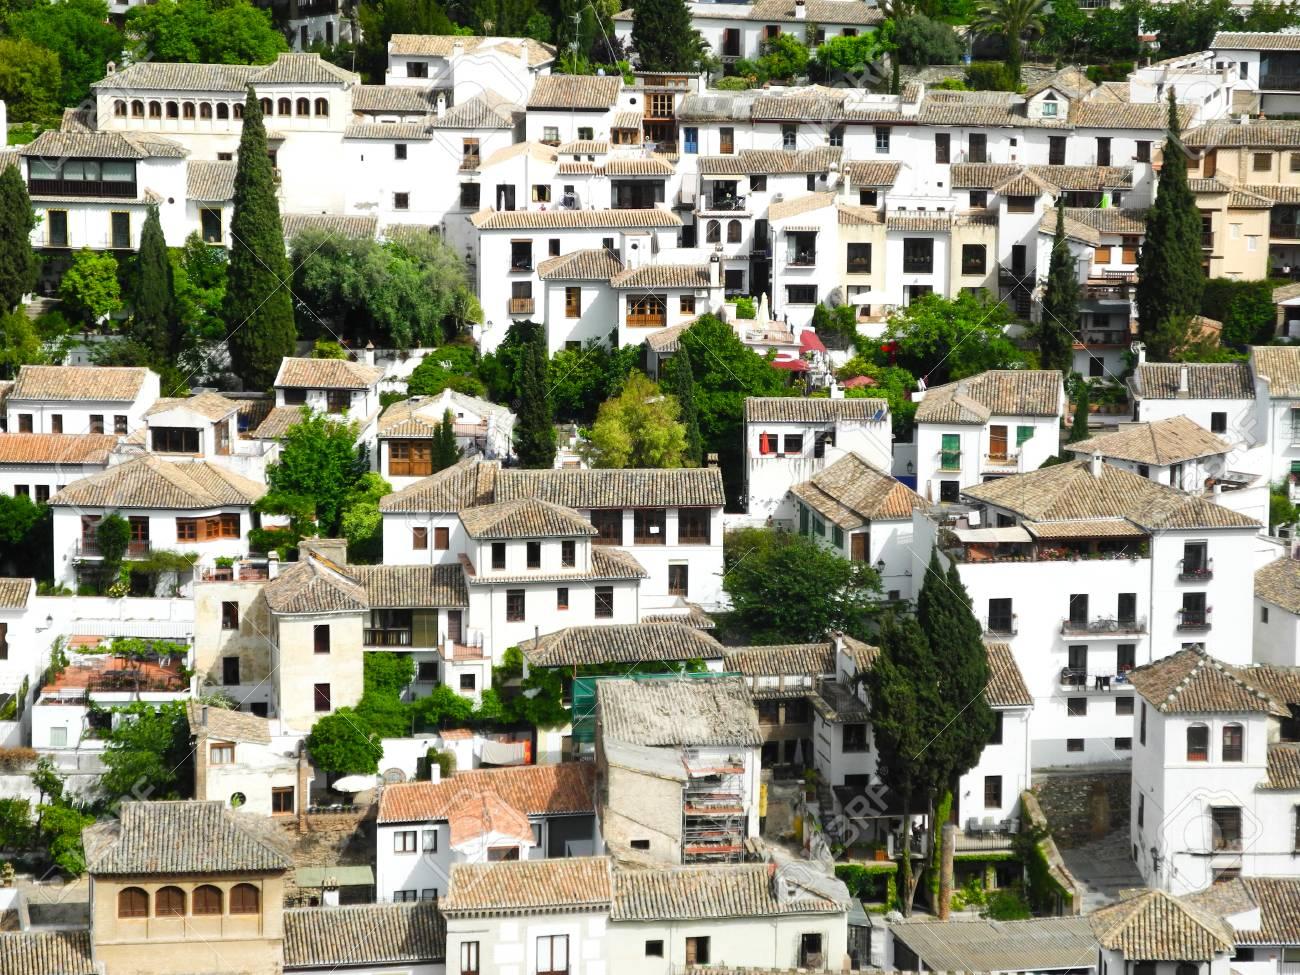 Granada, Spain  Albaicin - Moorish medieval quarter panoramic